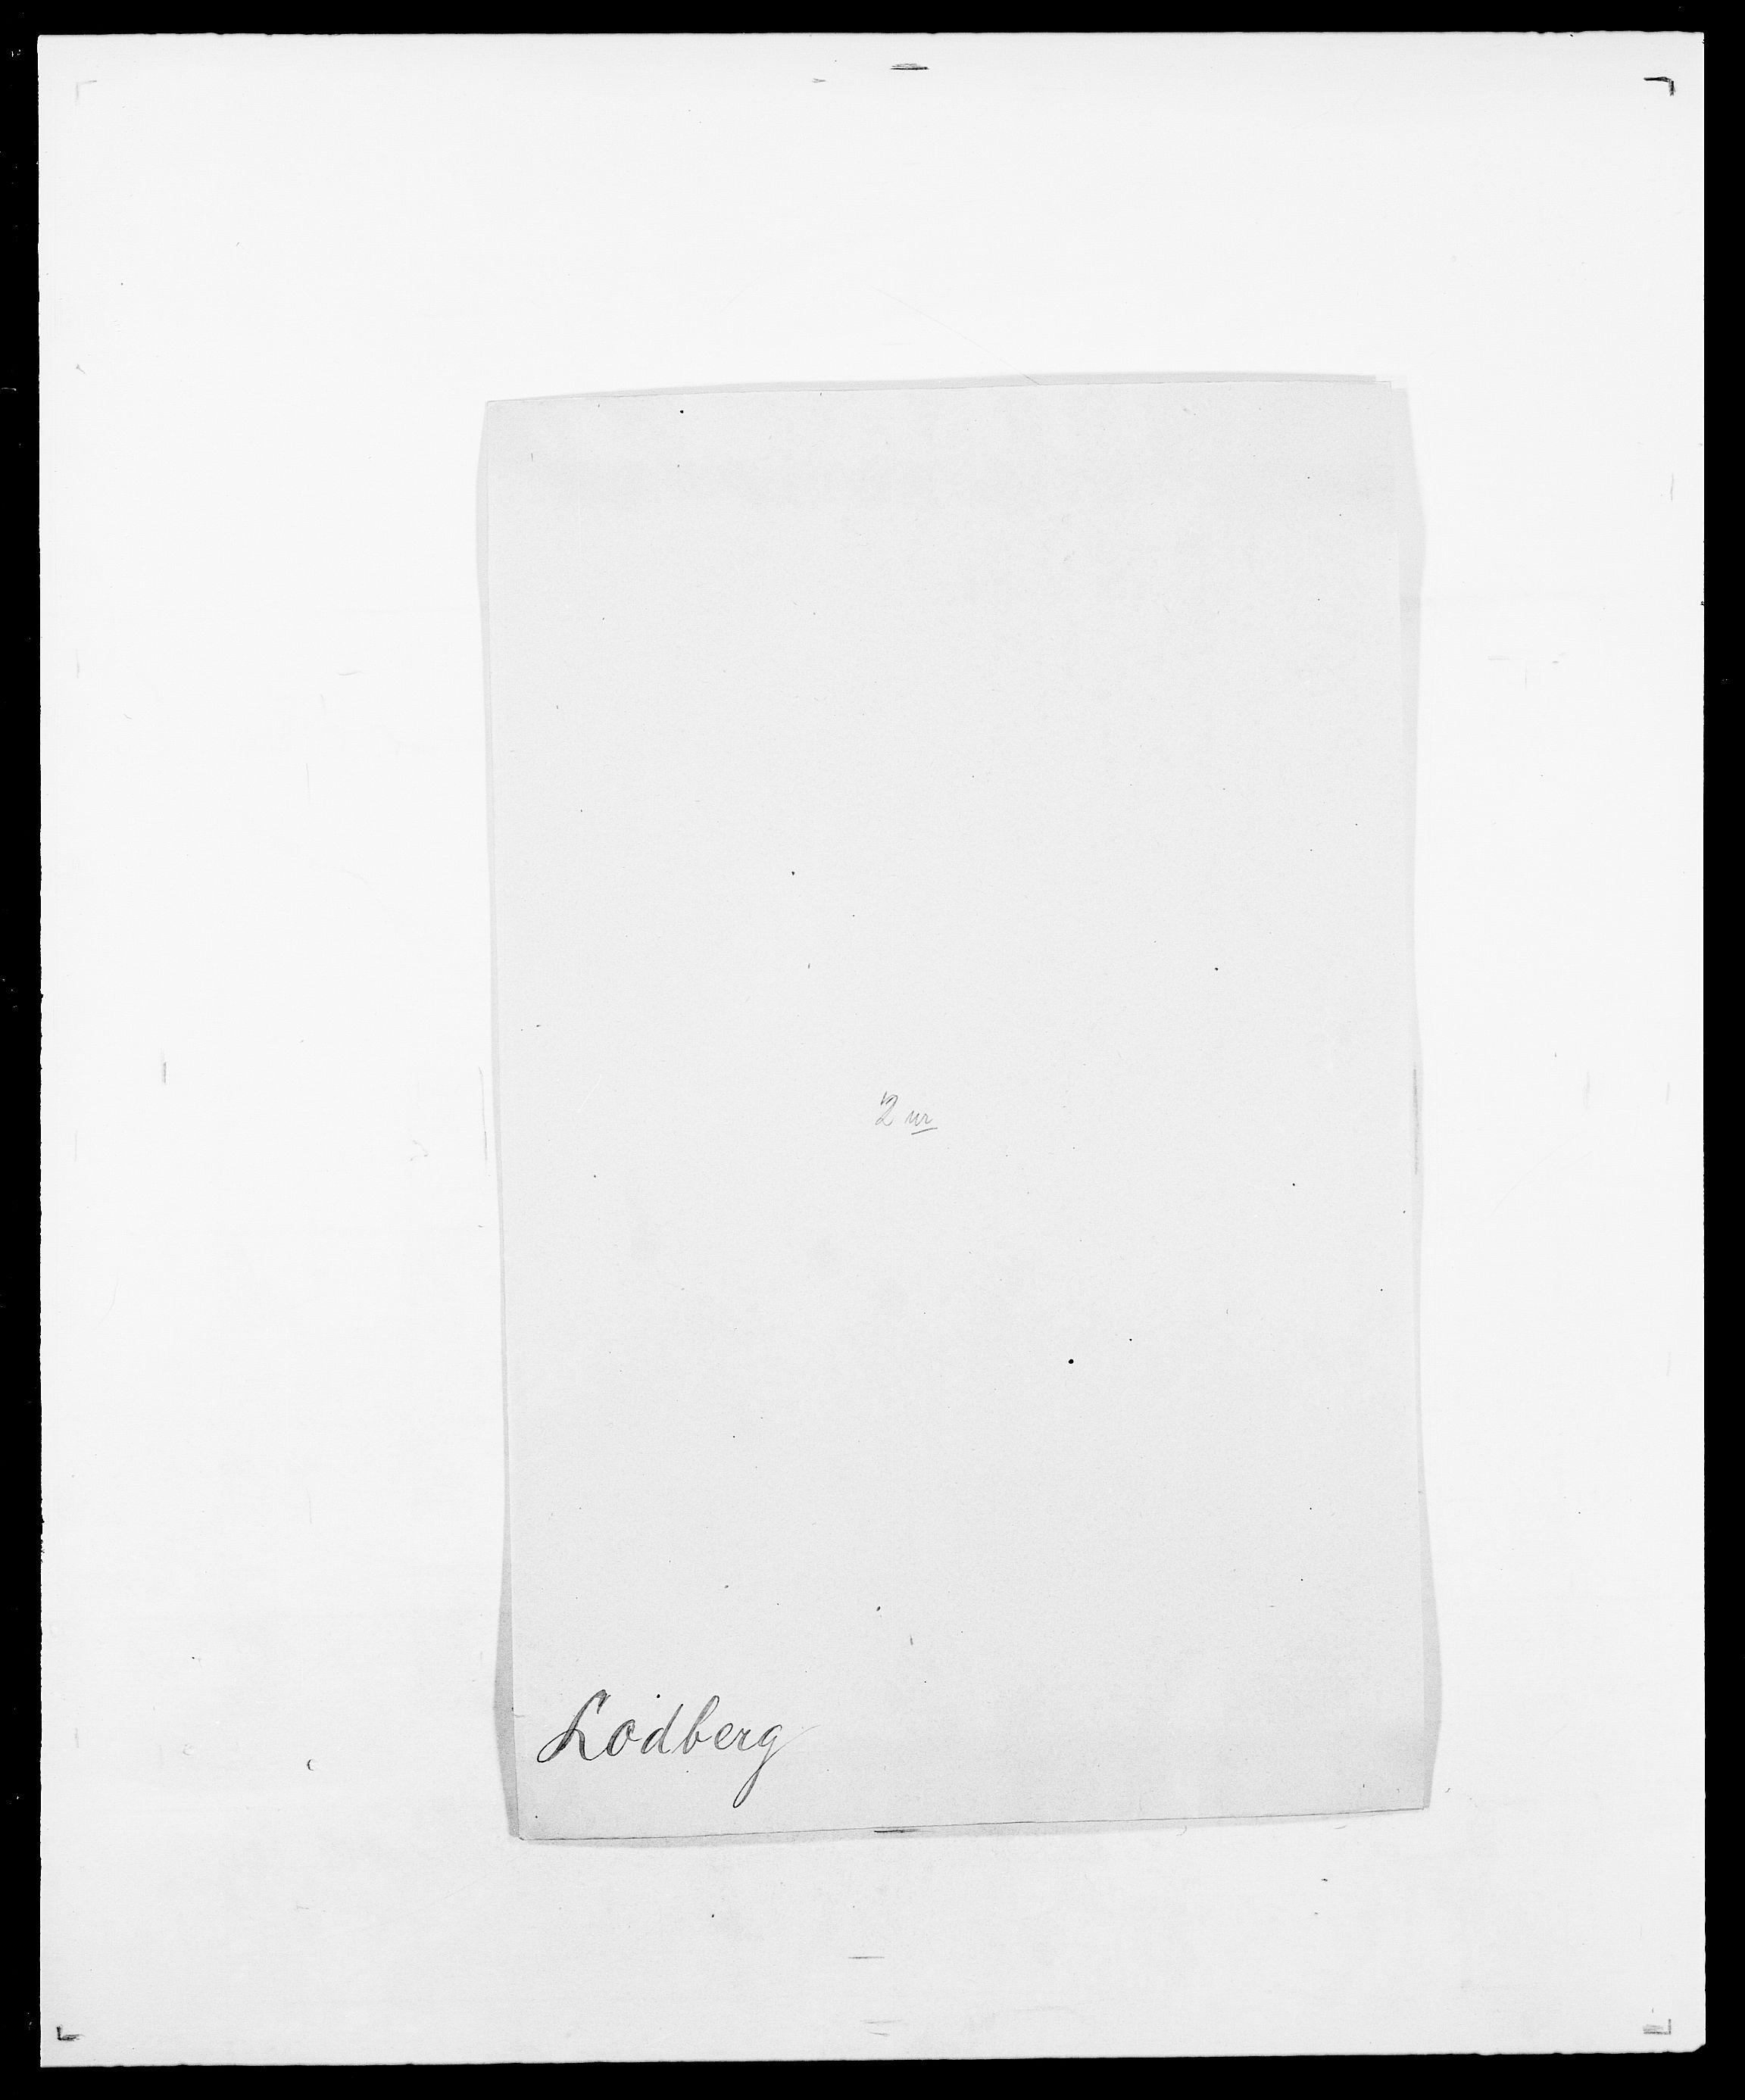 SAO, Delgobe, Charles Antoine - samling, D/Da/L0024: Lobech - Lærum, s. 29